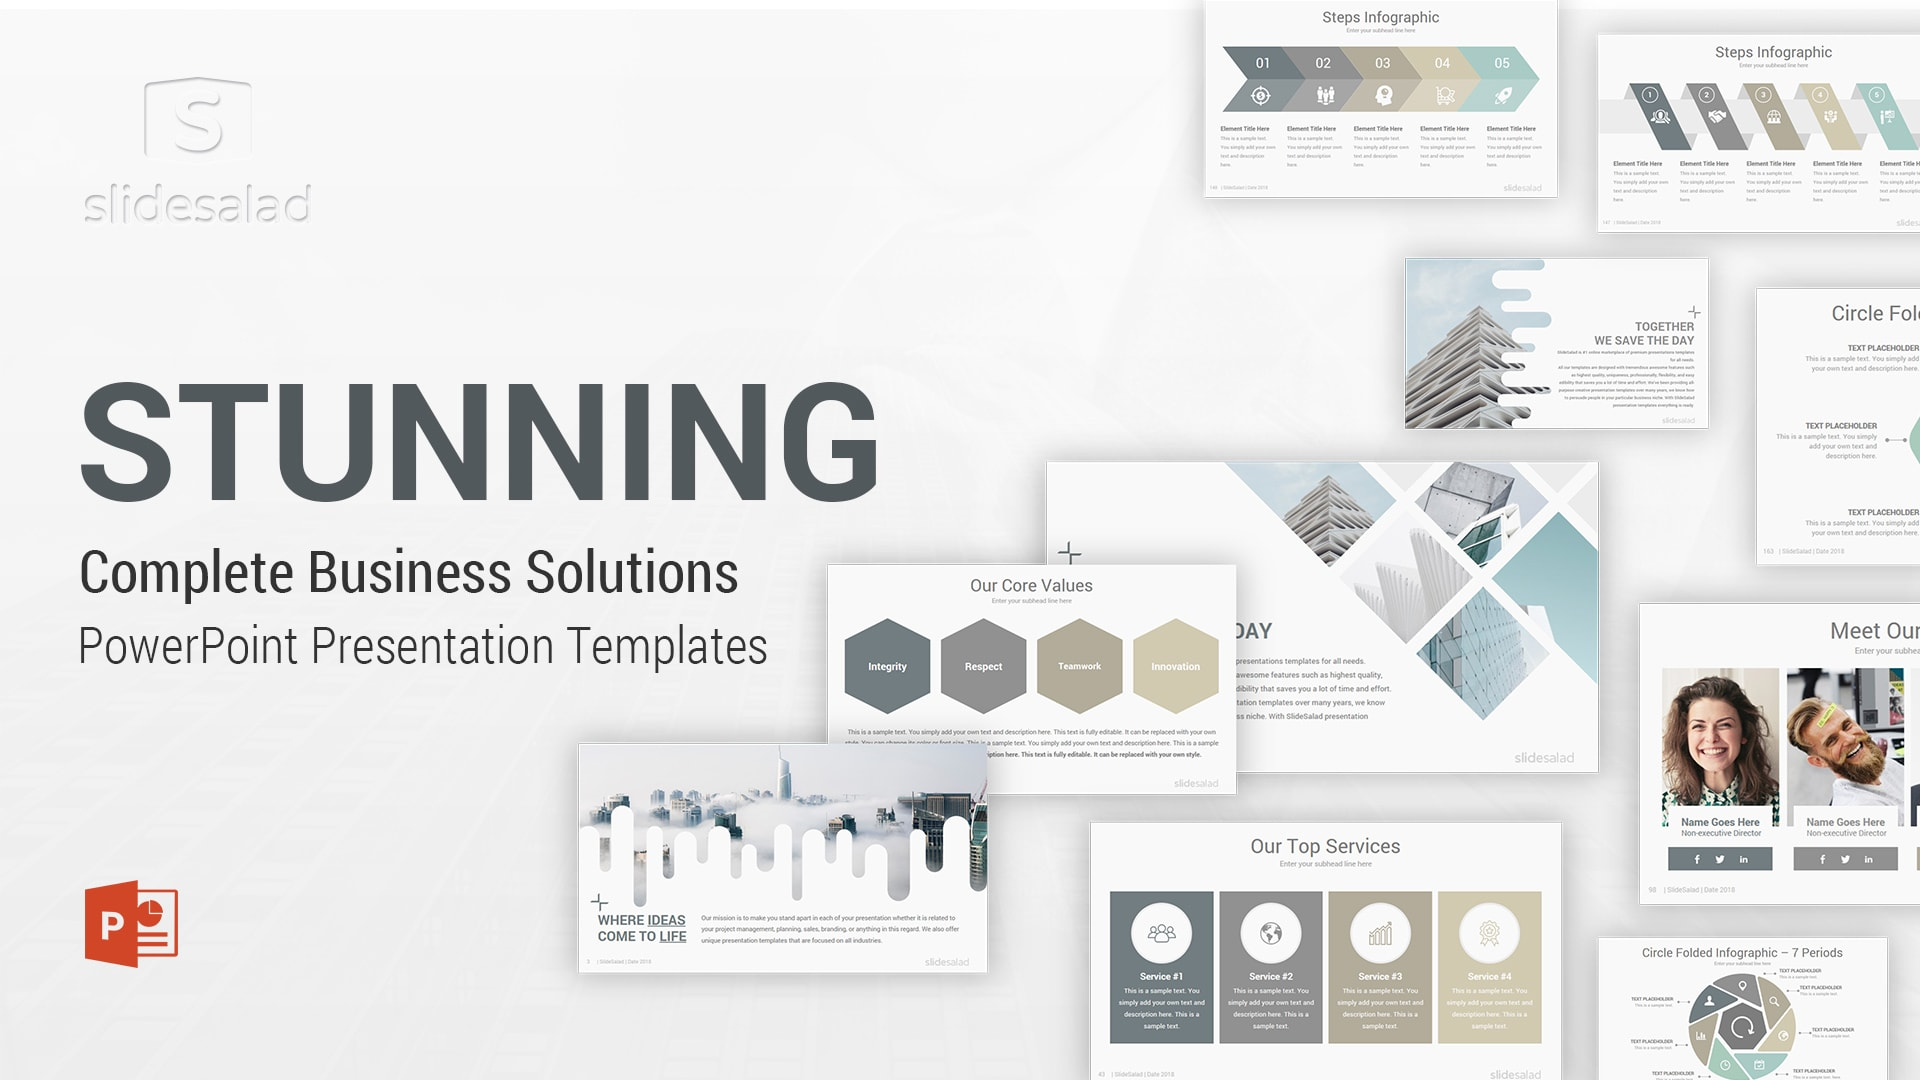 Best Powerpoint Templates Designs Of 2020 Slidesalad